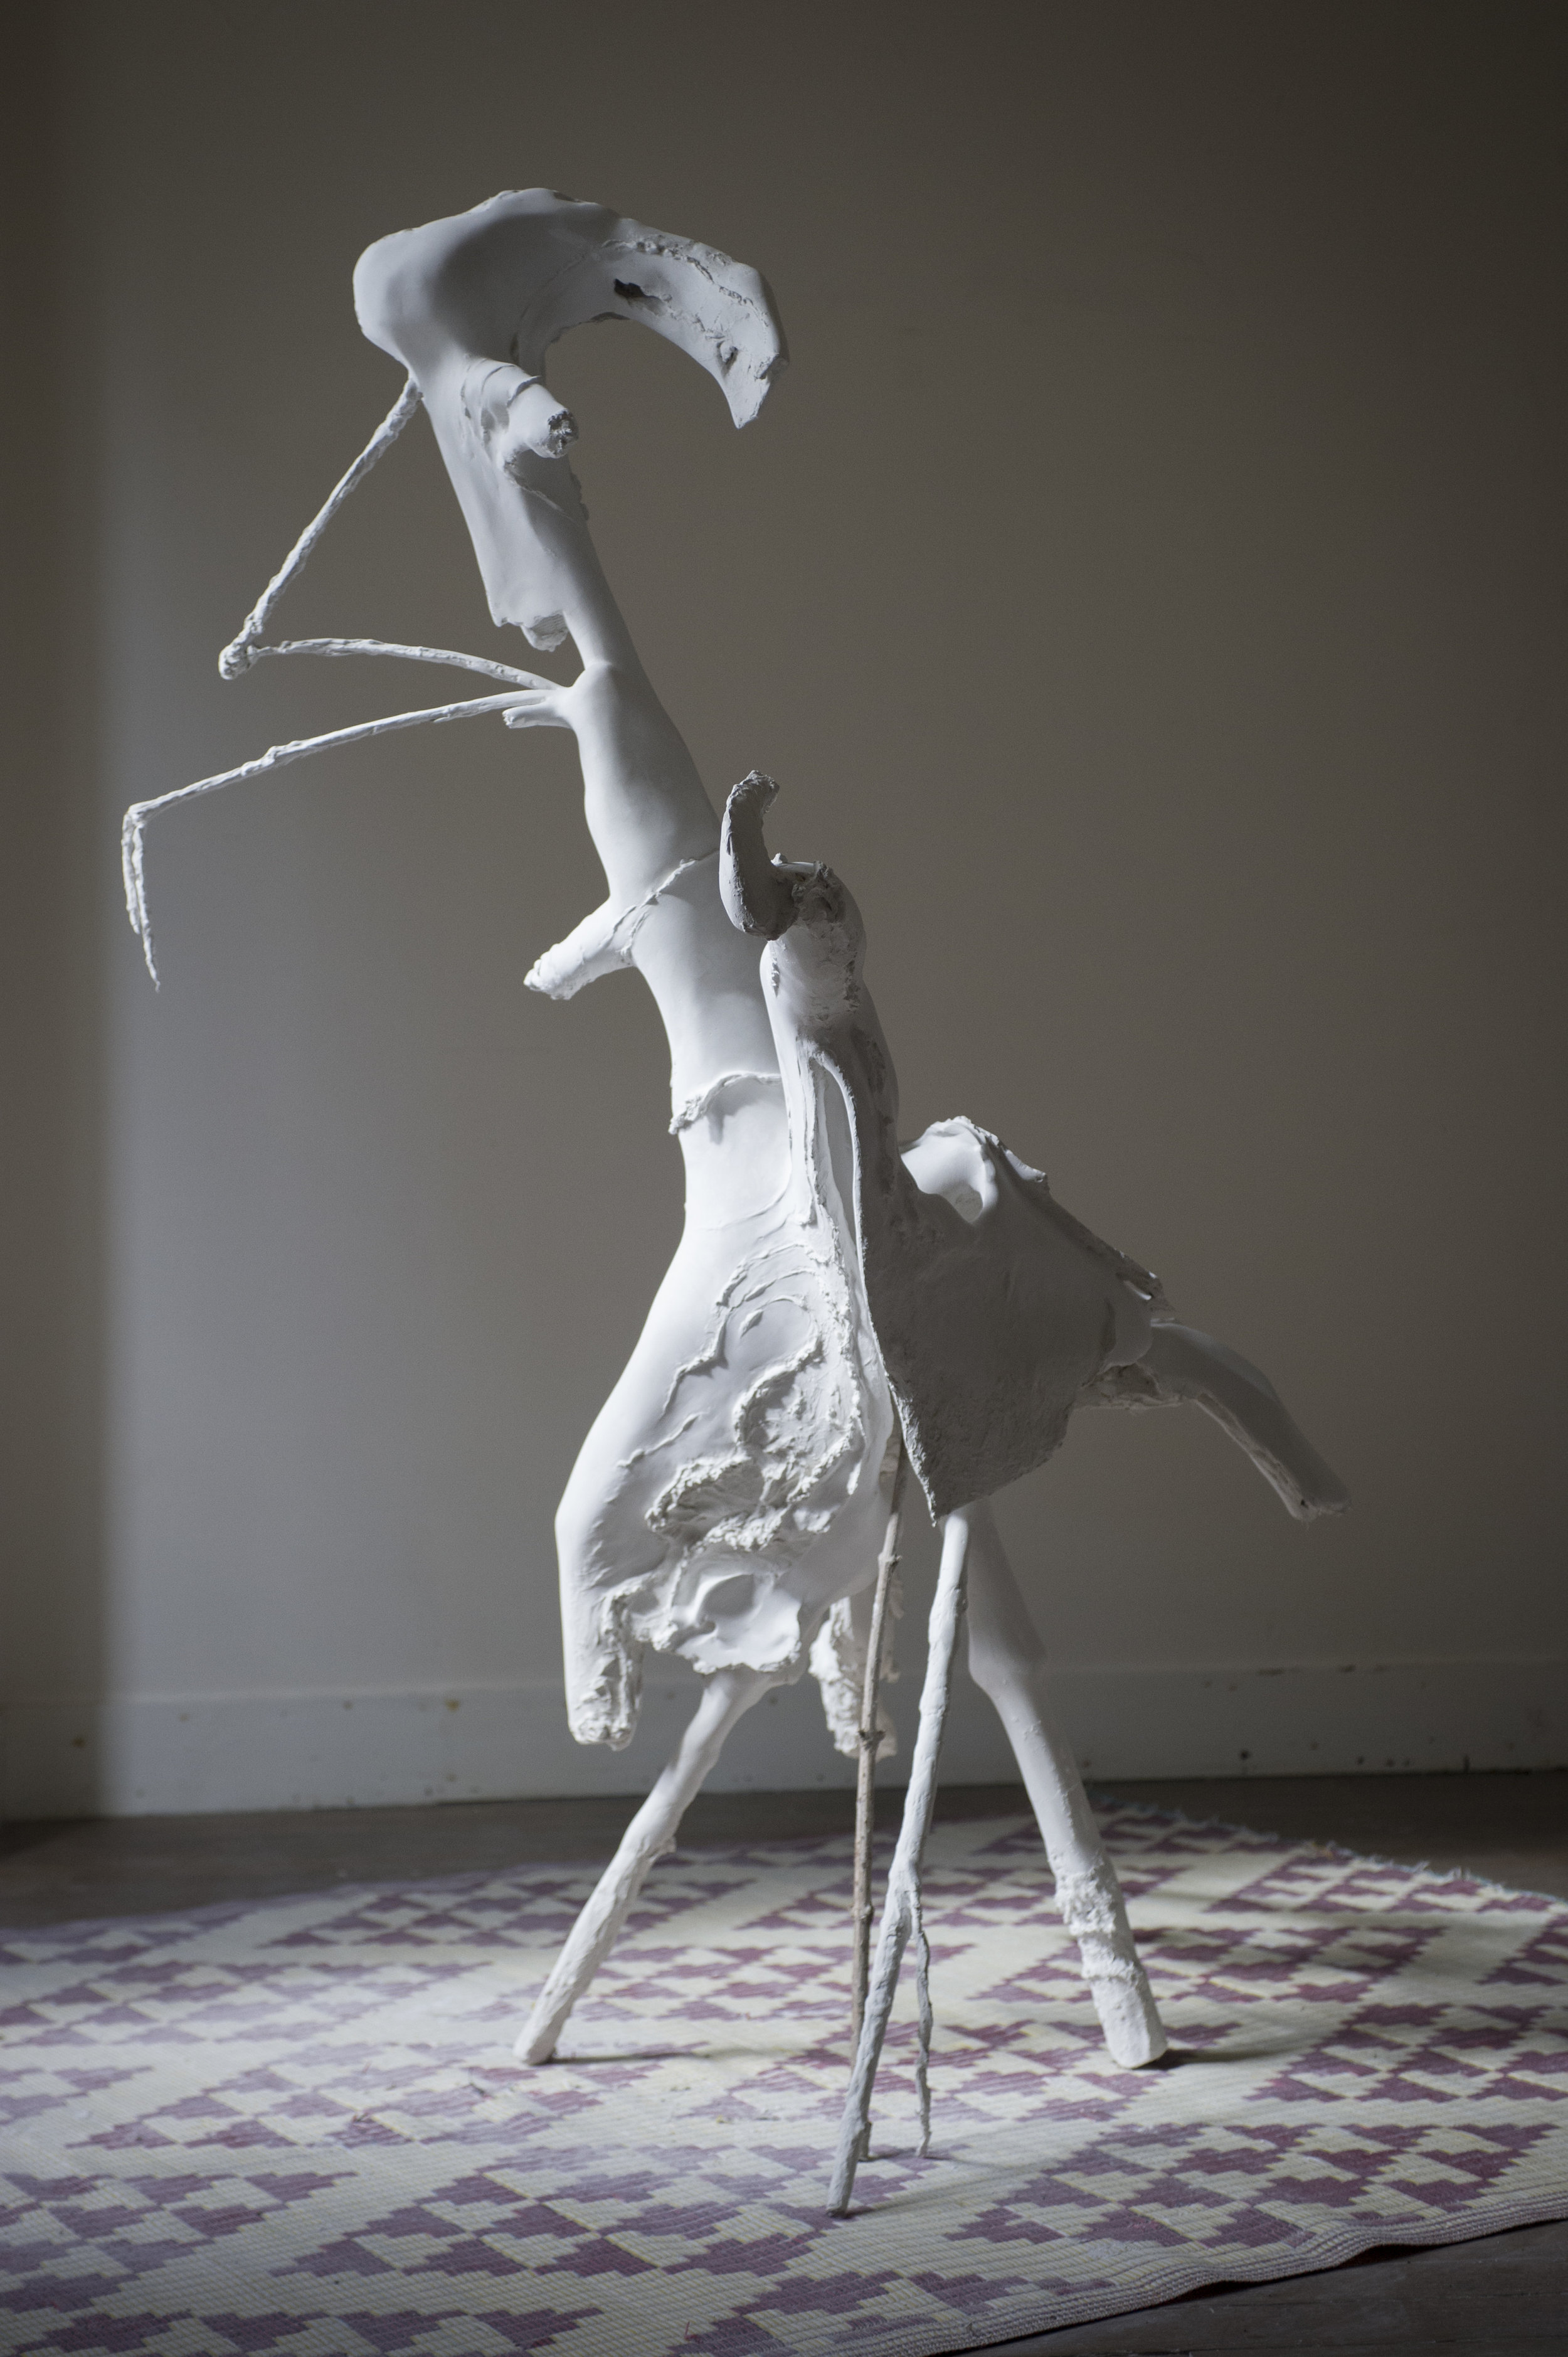 U caracolu - La danse des grues